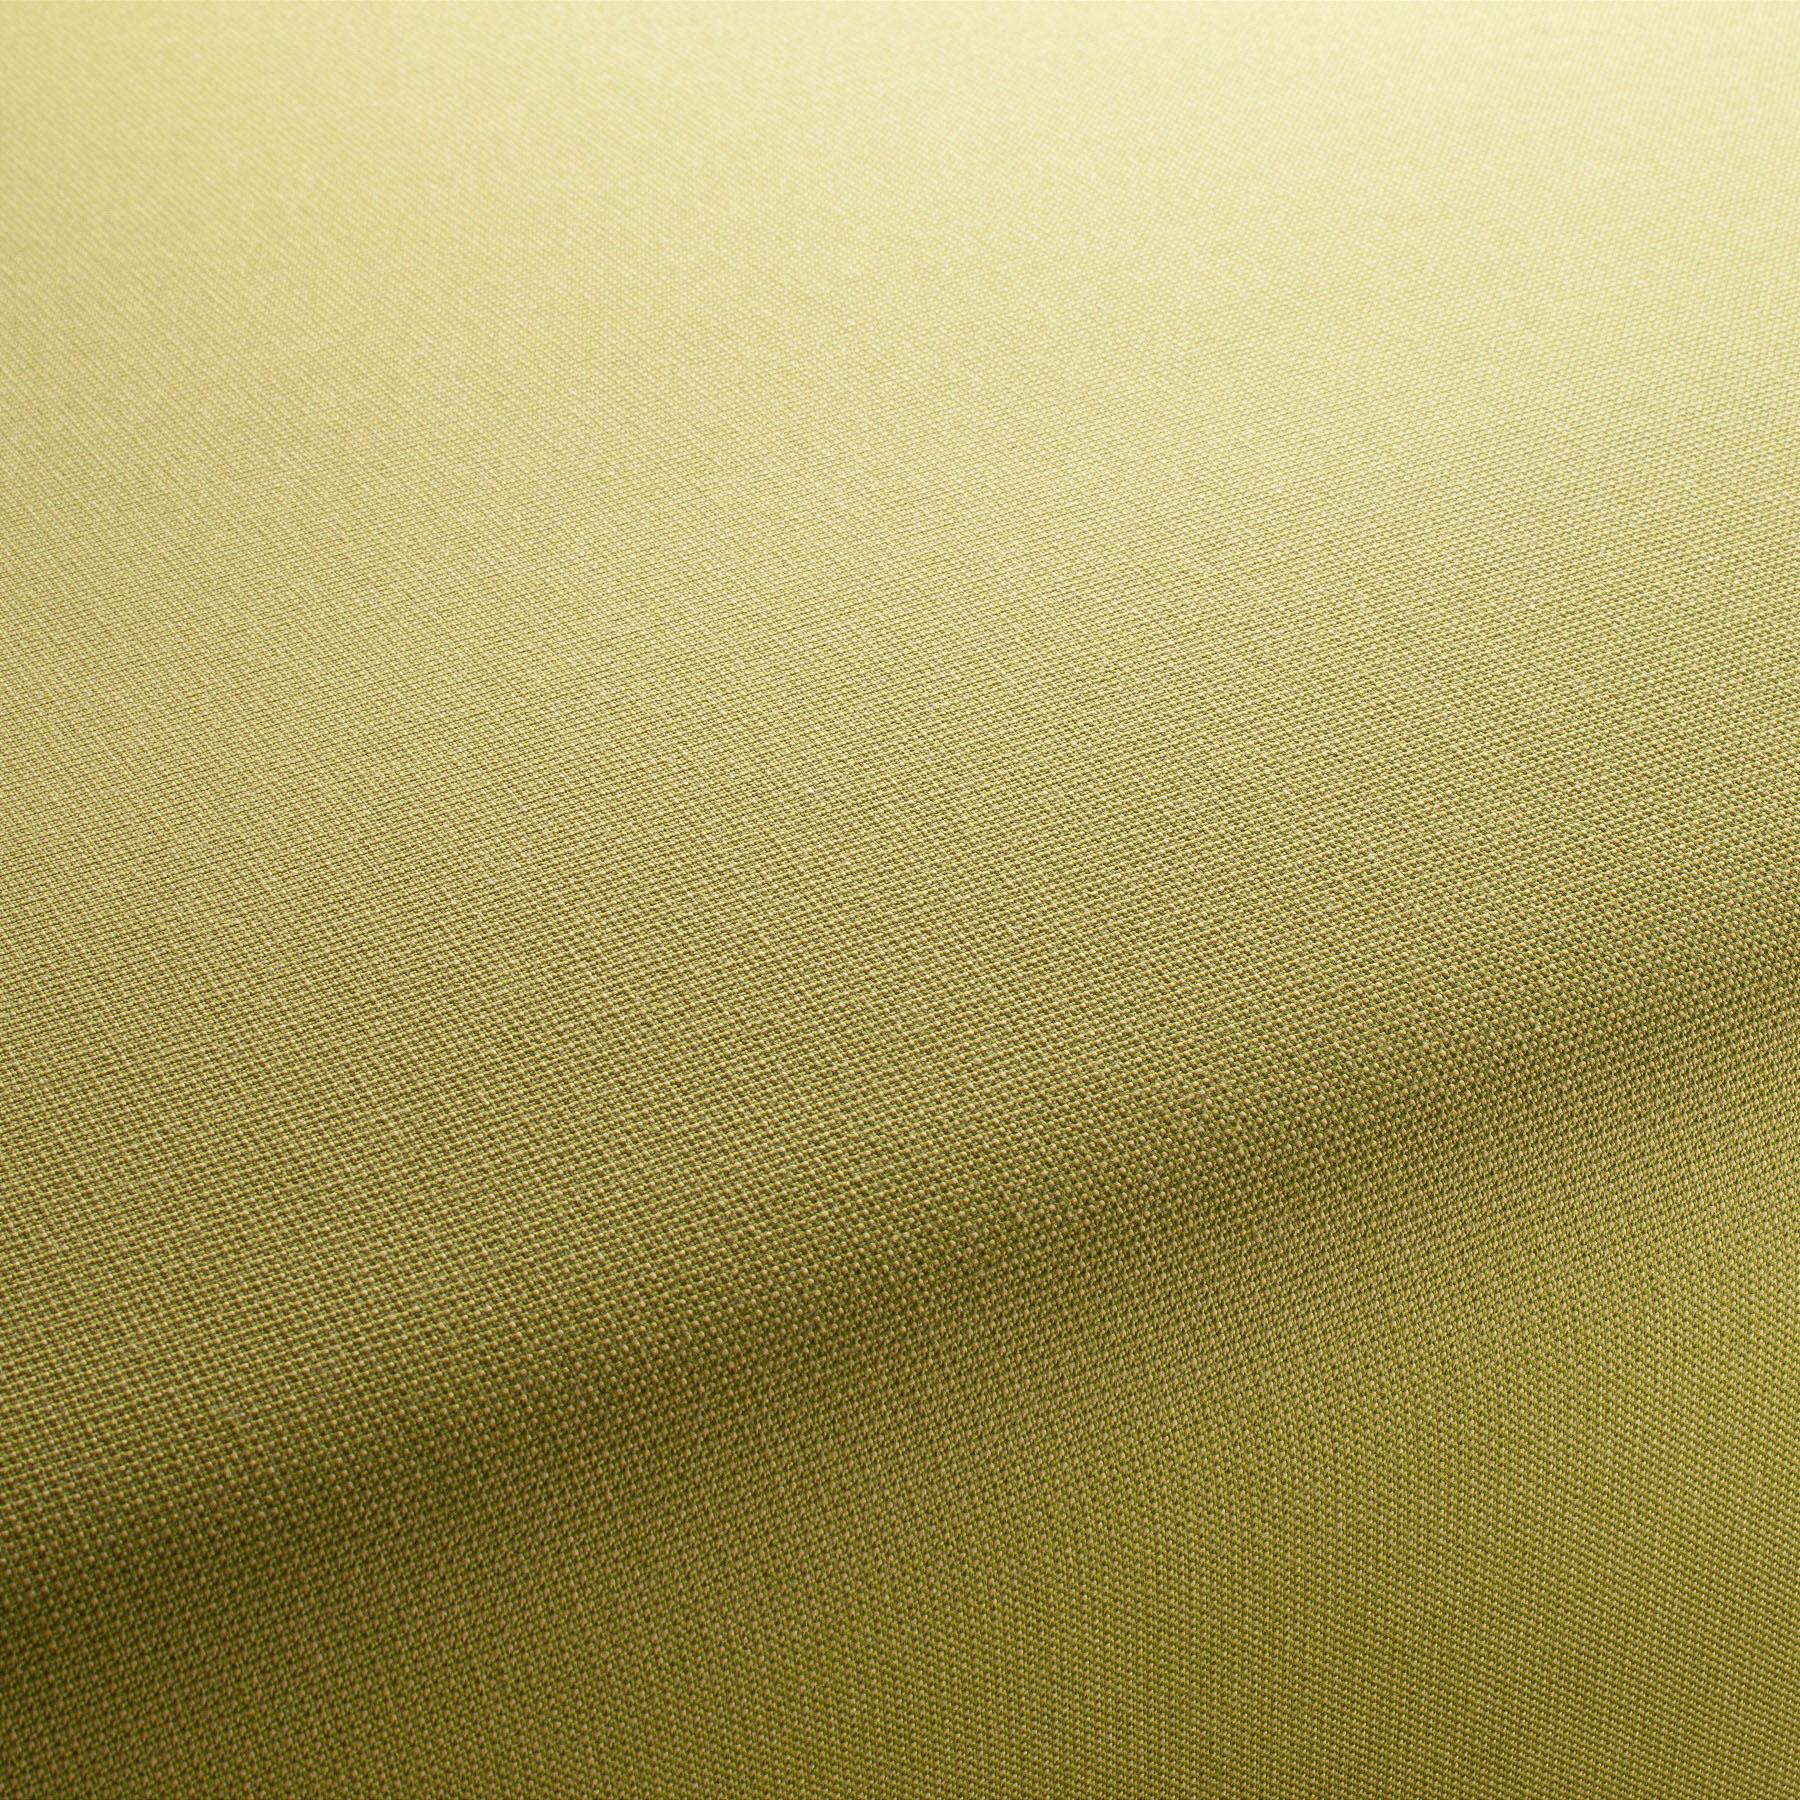 upholstery fabric gino 1 1275 031 jab anstoetz. Black Bedroom Furniture Sets. Home Design Ideas